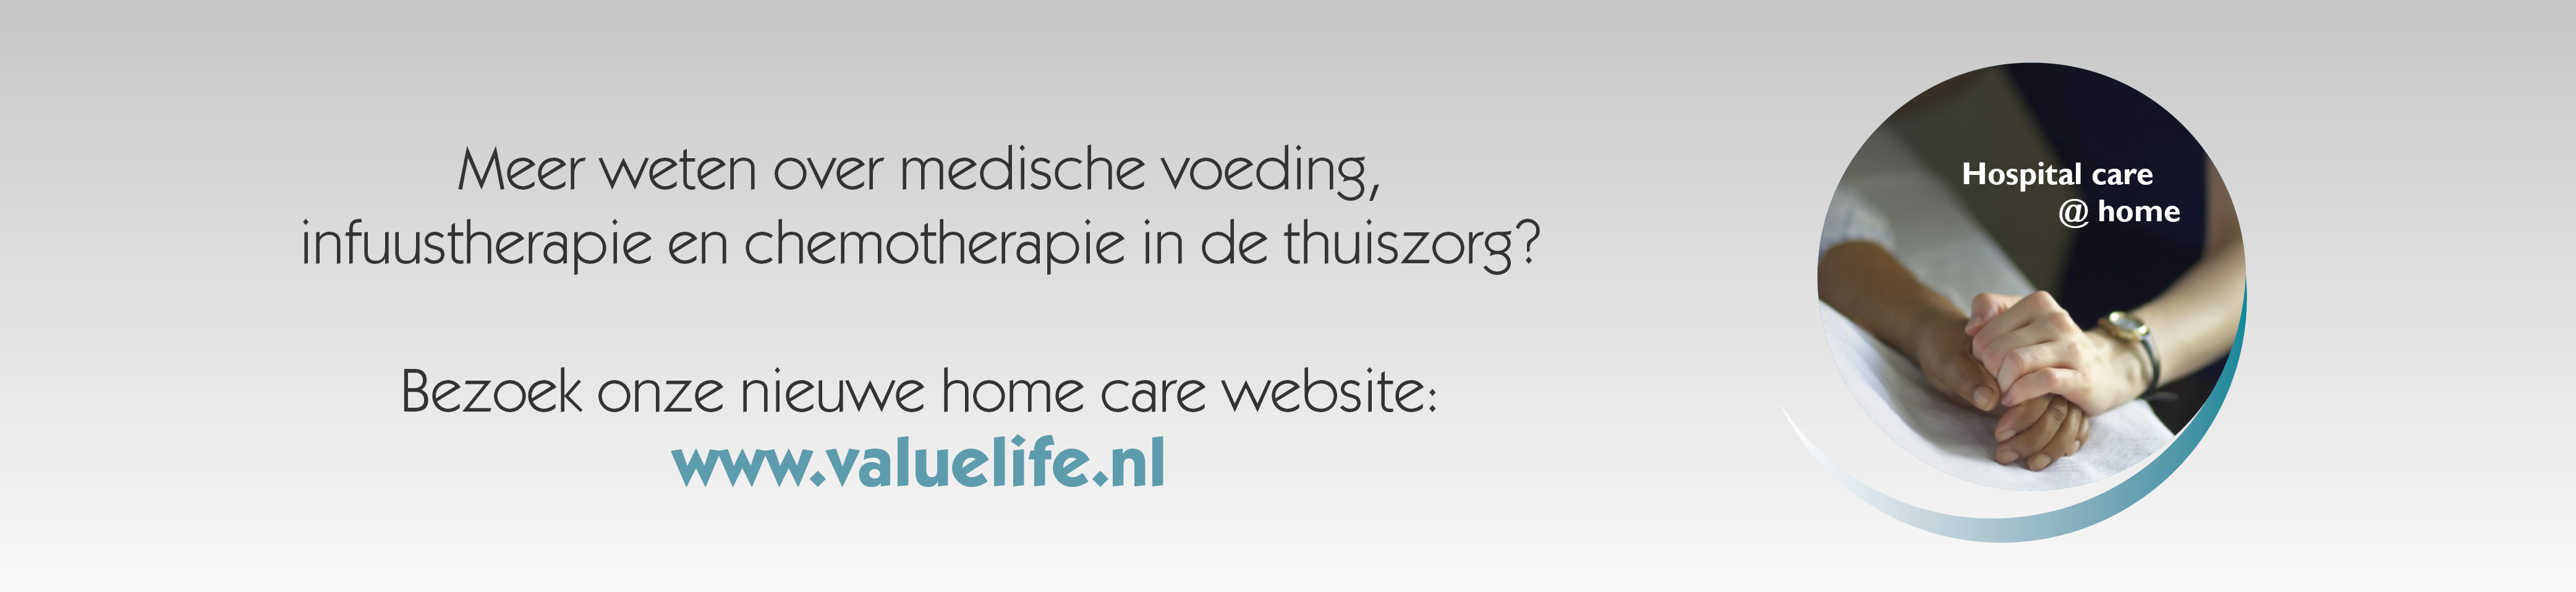 VY16090 - NL Banner homecare website (30.09.2016)